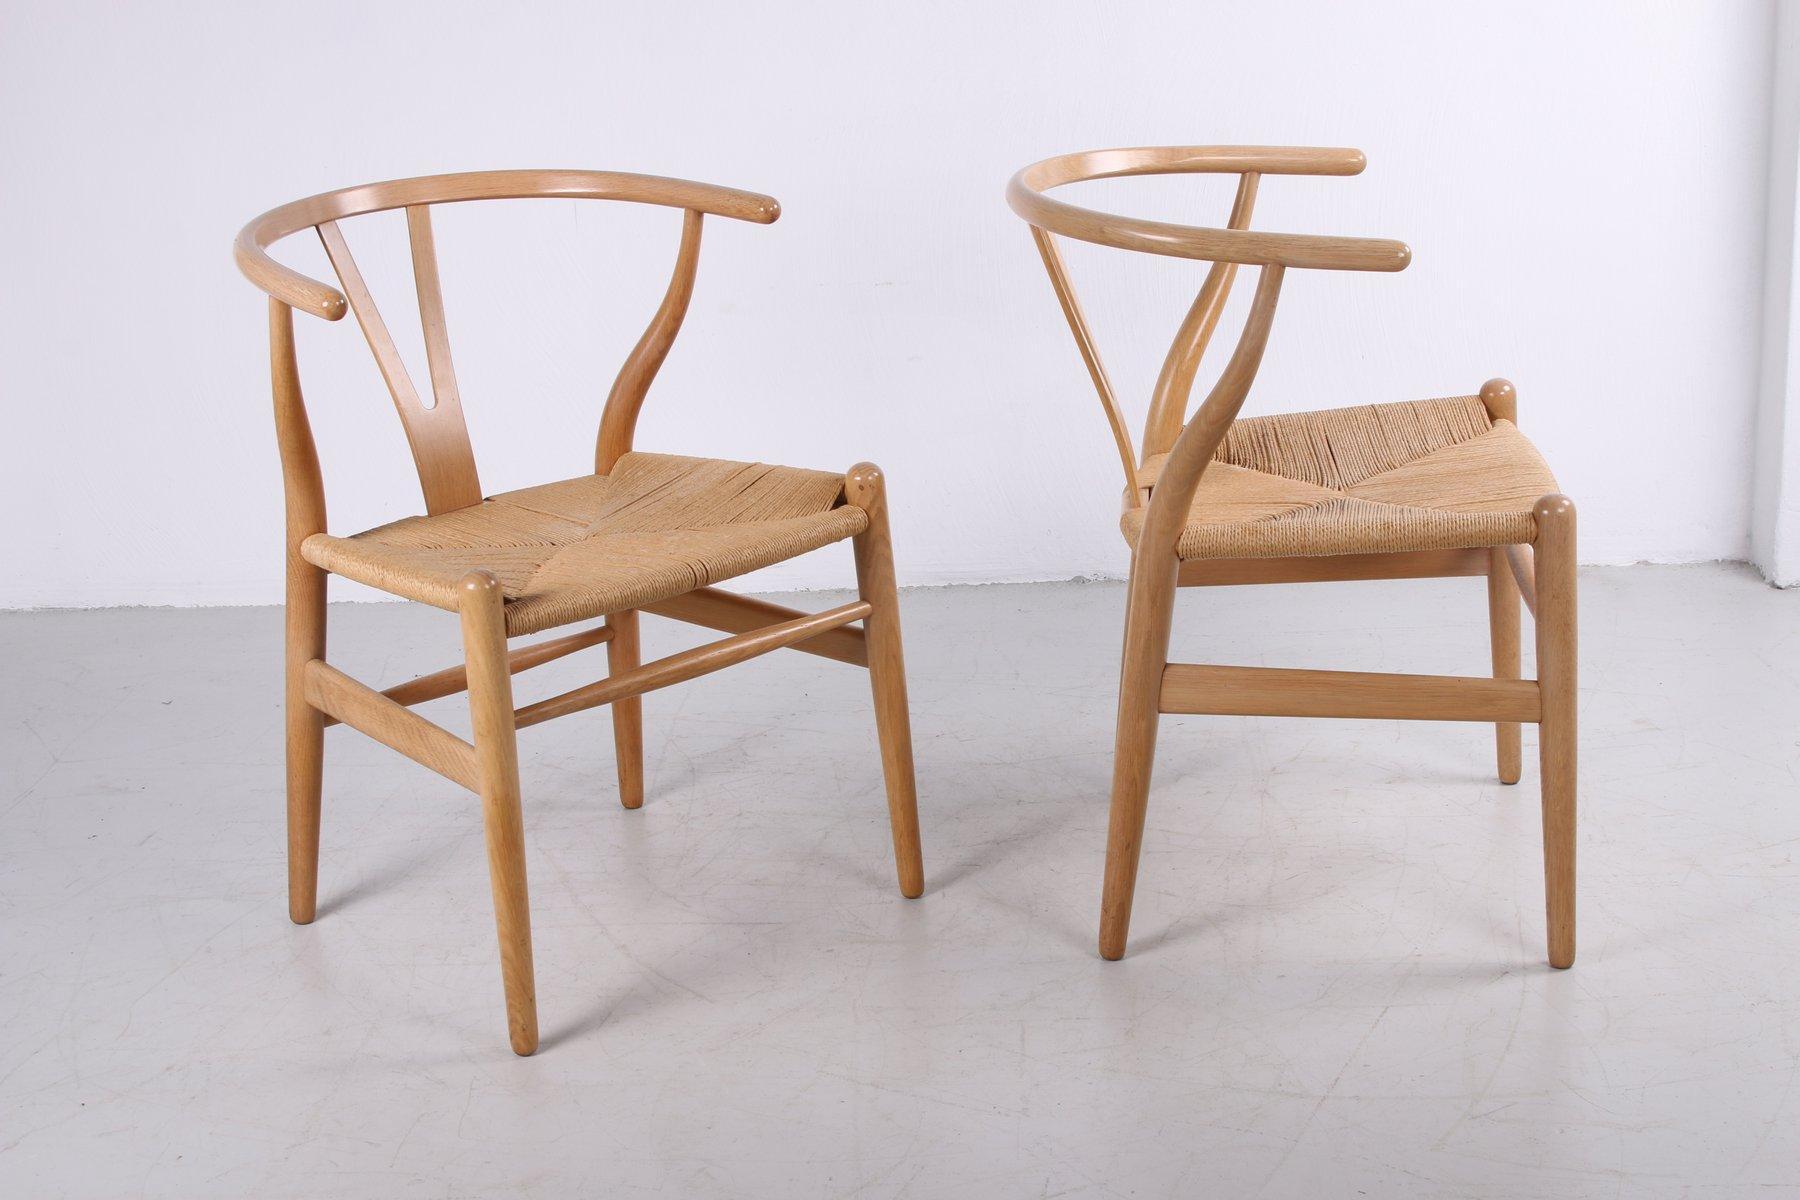 Modern Furniture CH24 Wishbone Dining Chairs by Hans J. Wegner for Carl Hansen 6